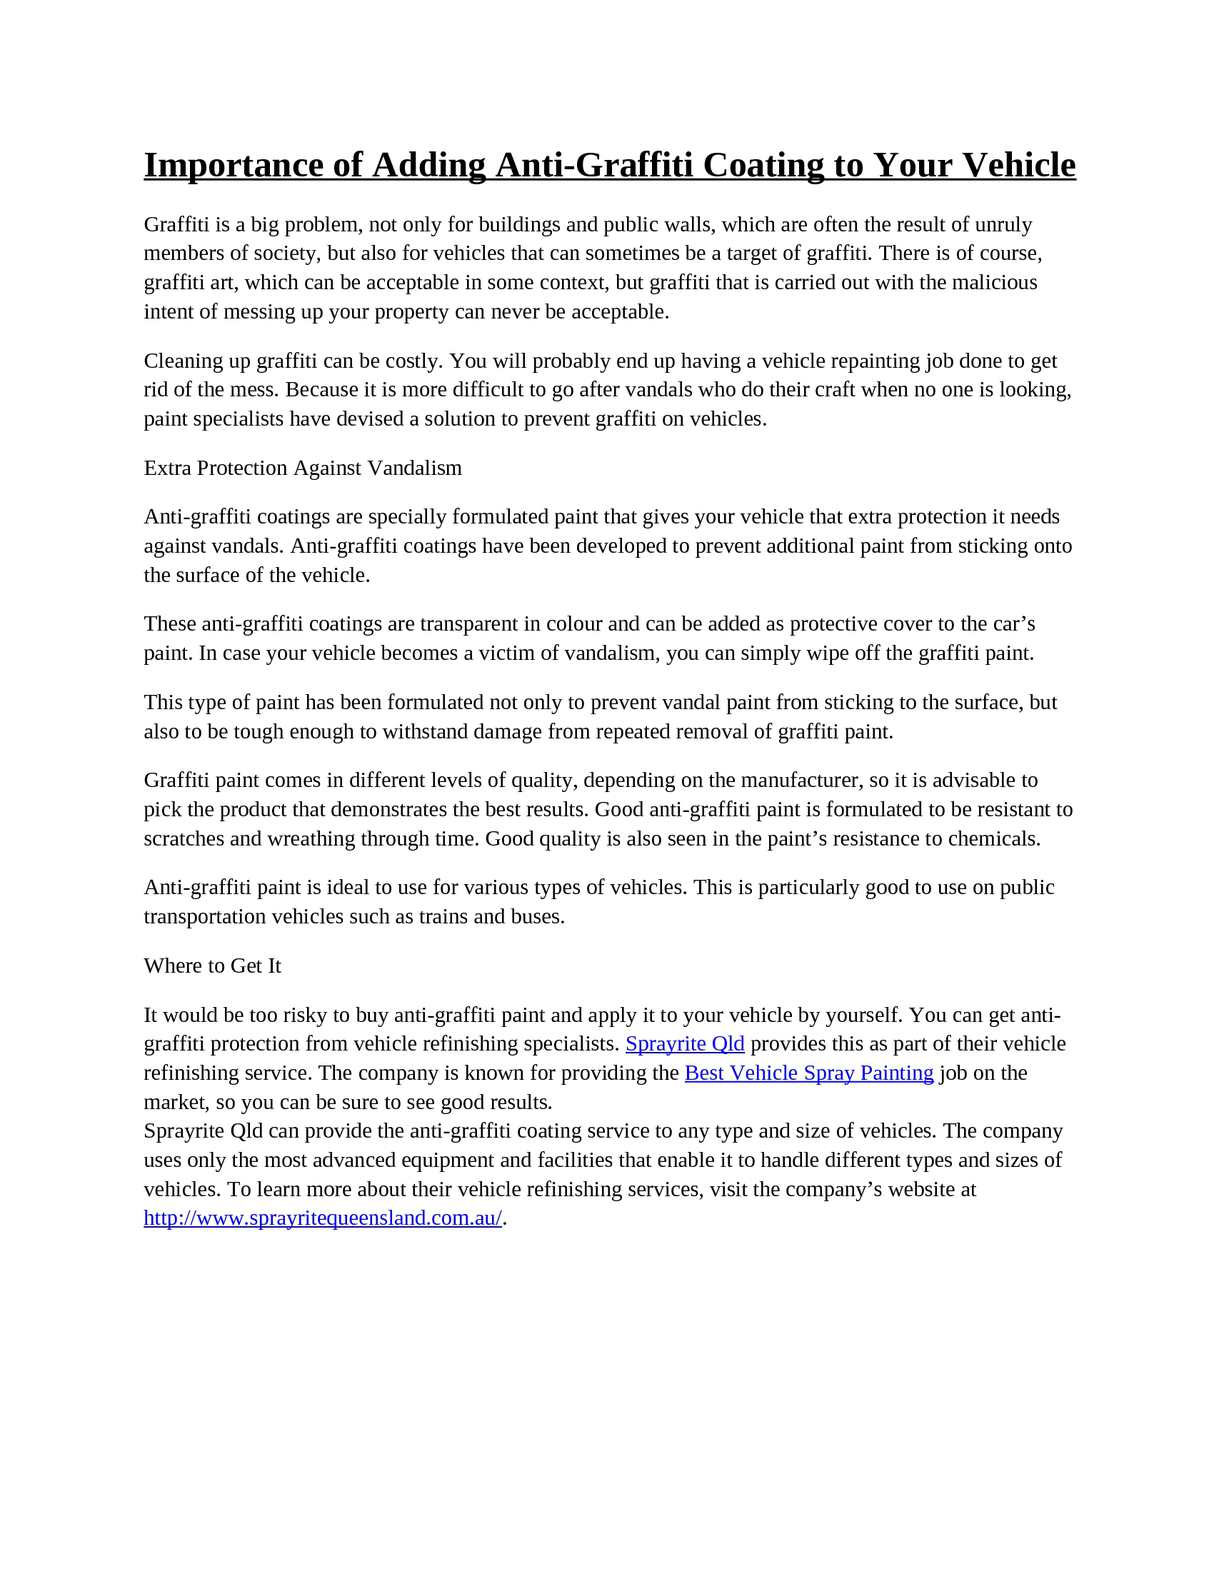 Calaméo - Importance of Adding Anti-Graffiti Coating to Your Vehicle